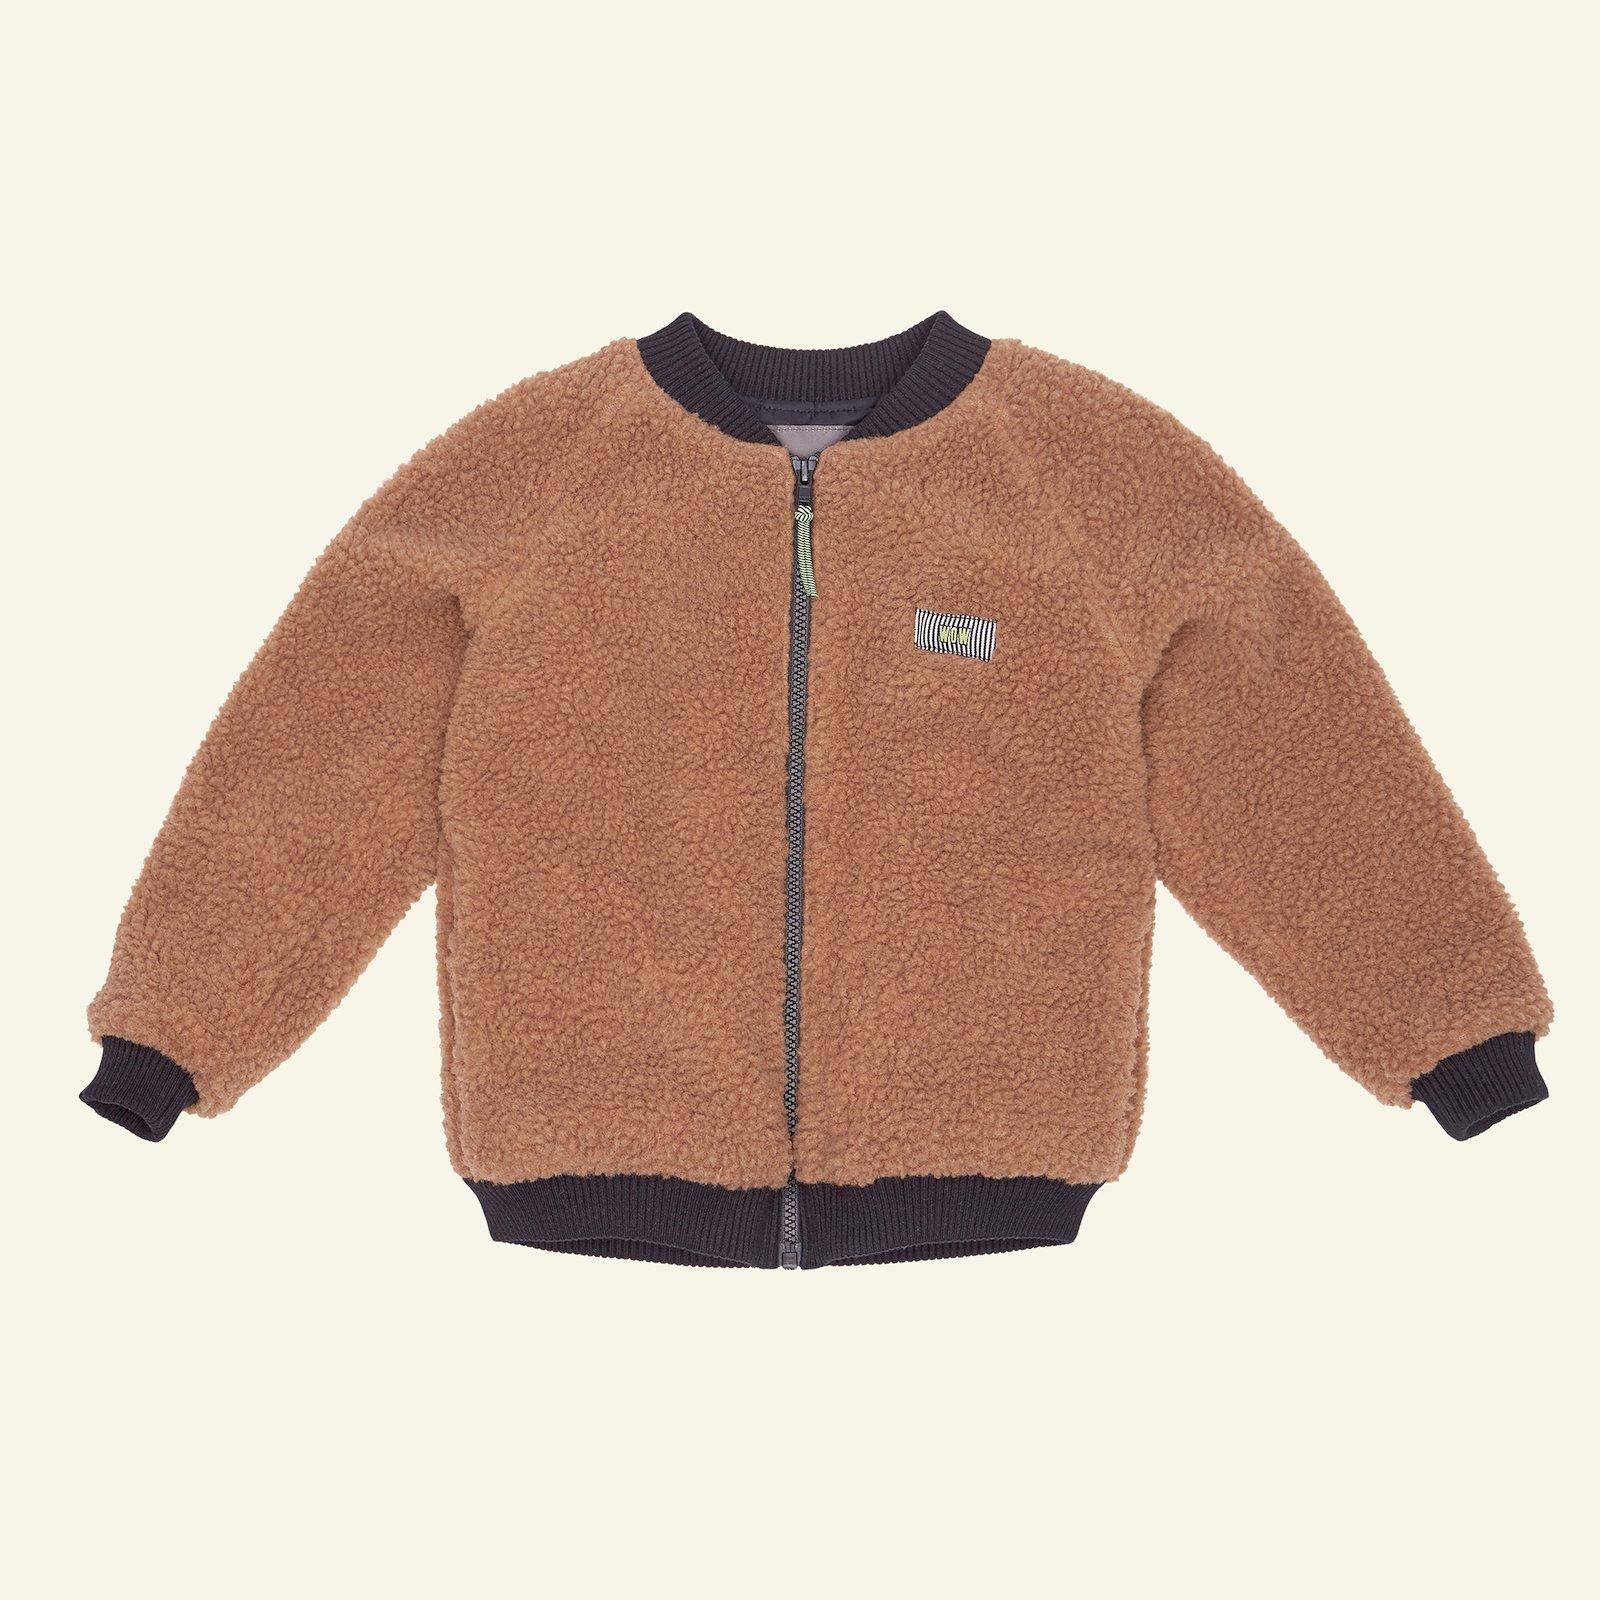 Bomber jacket, 164/14y p64017_910274_96077_26437_sskit